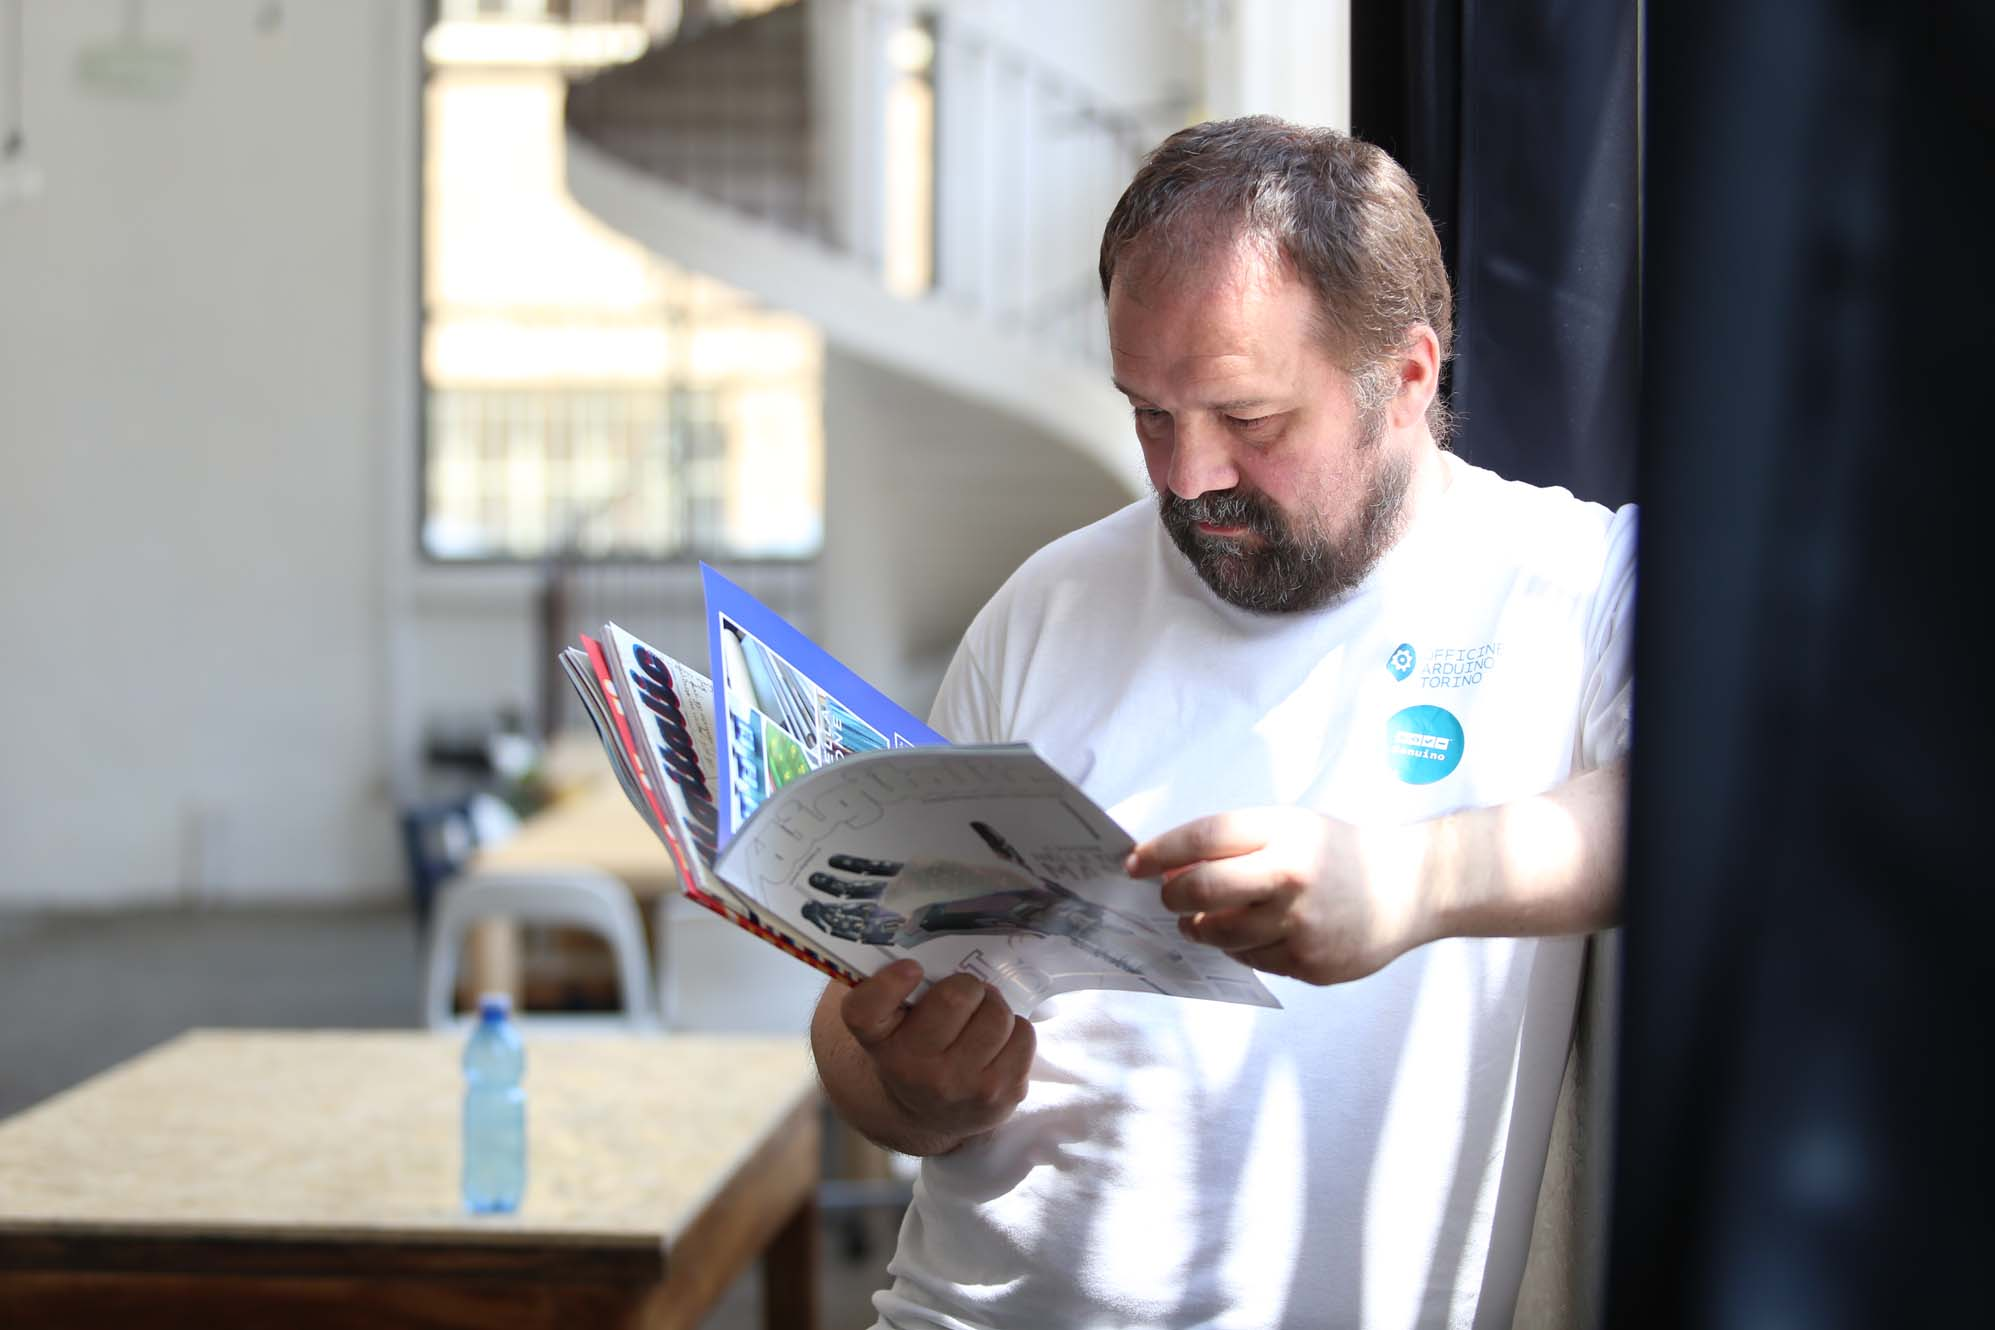 Massimo Banzi Arduino #DigiScovering #PowerdByPixartPrinting